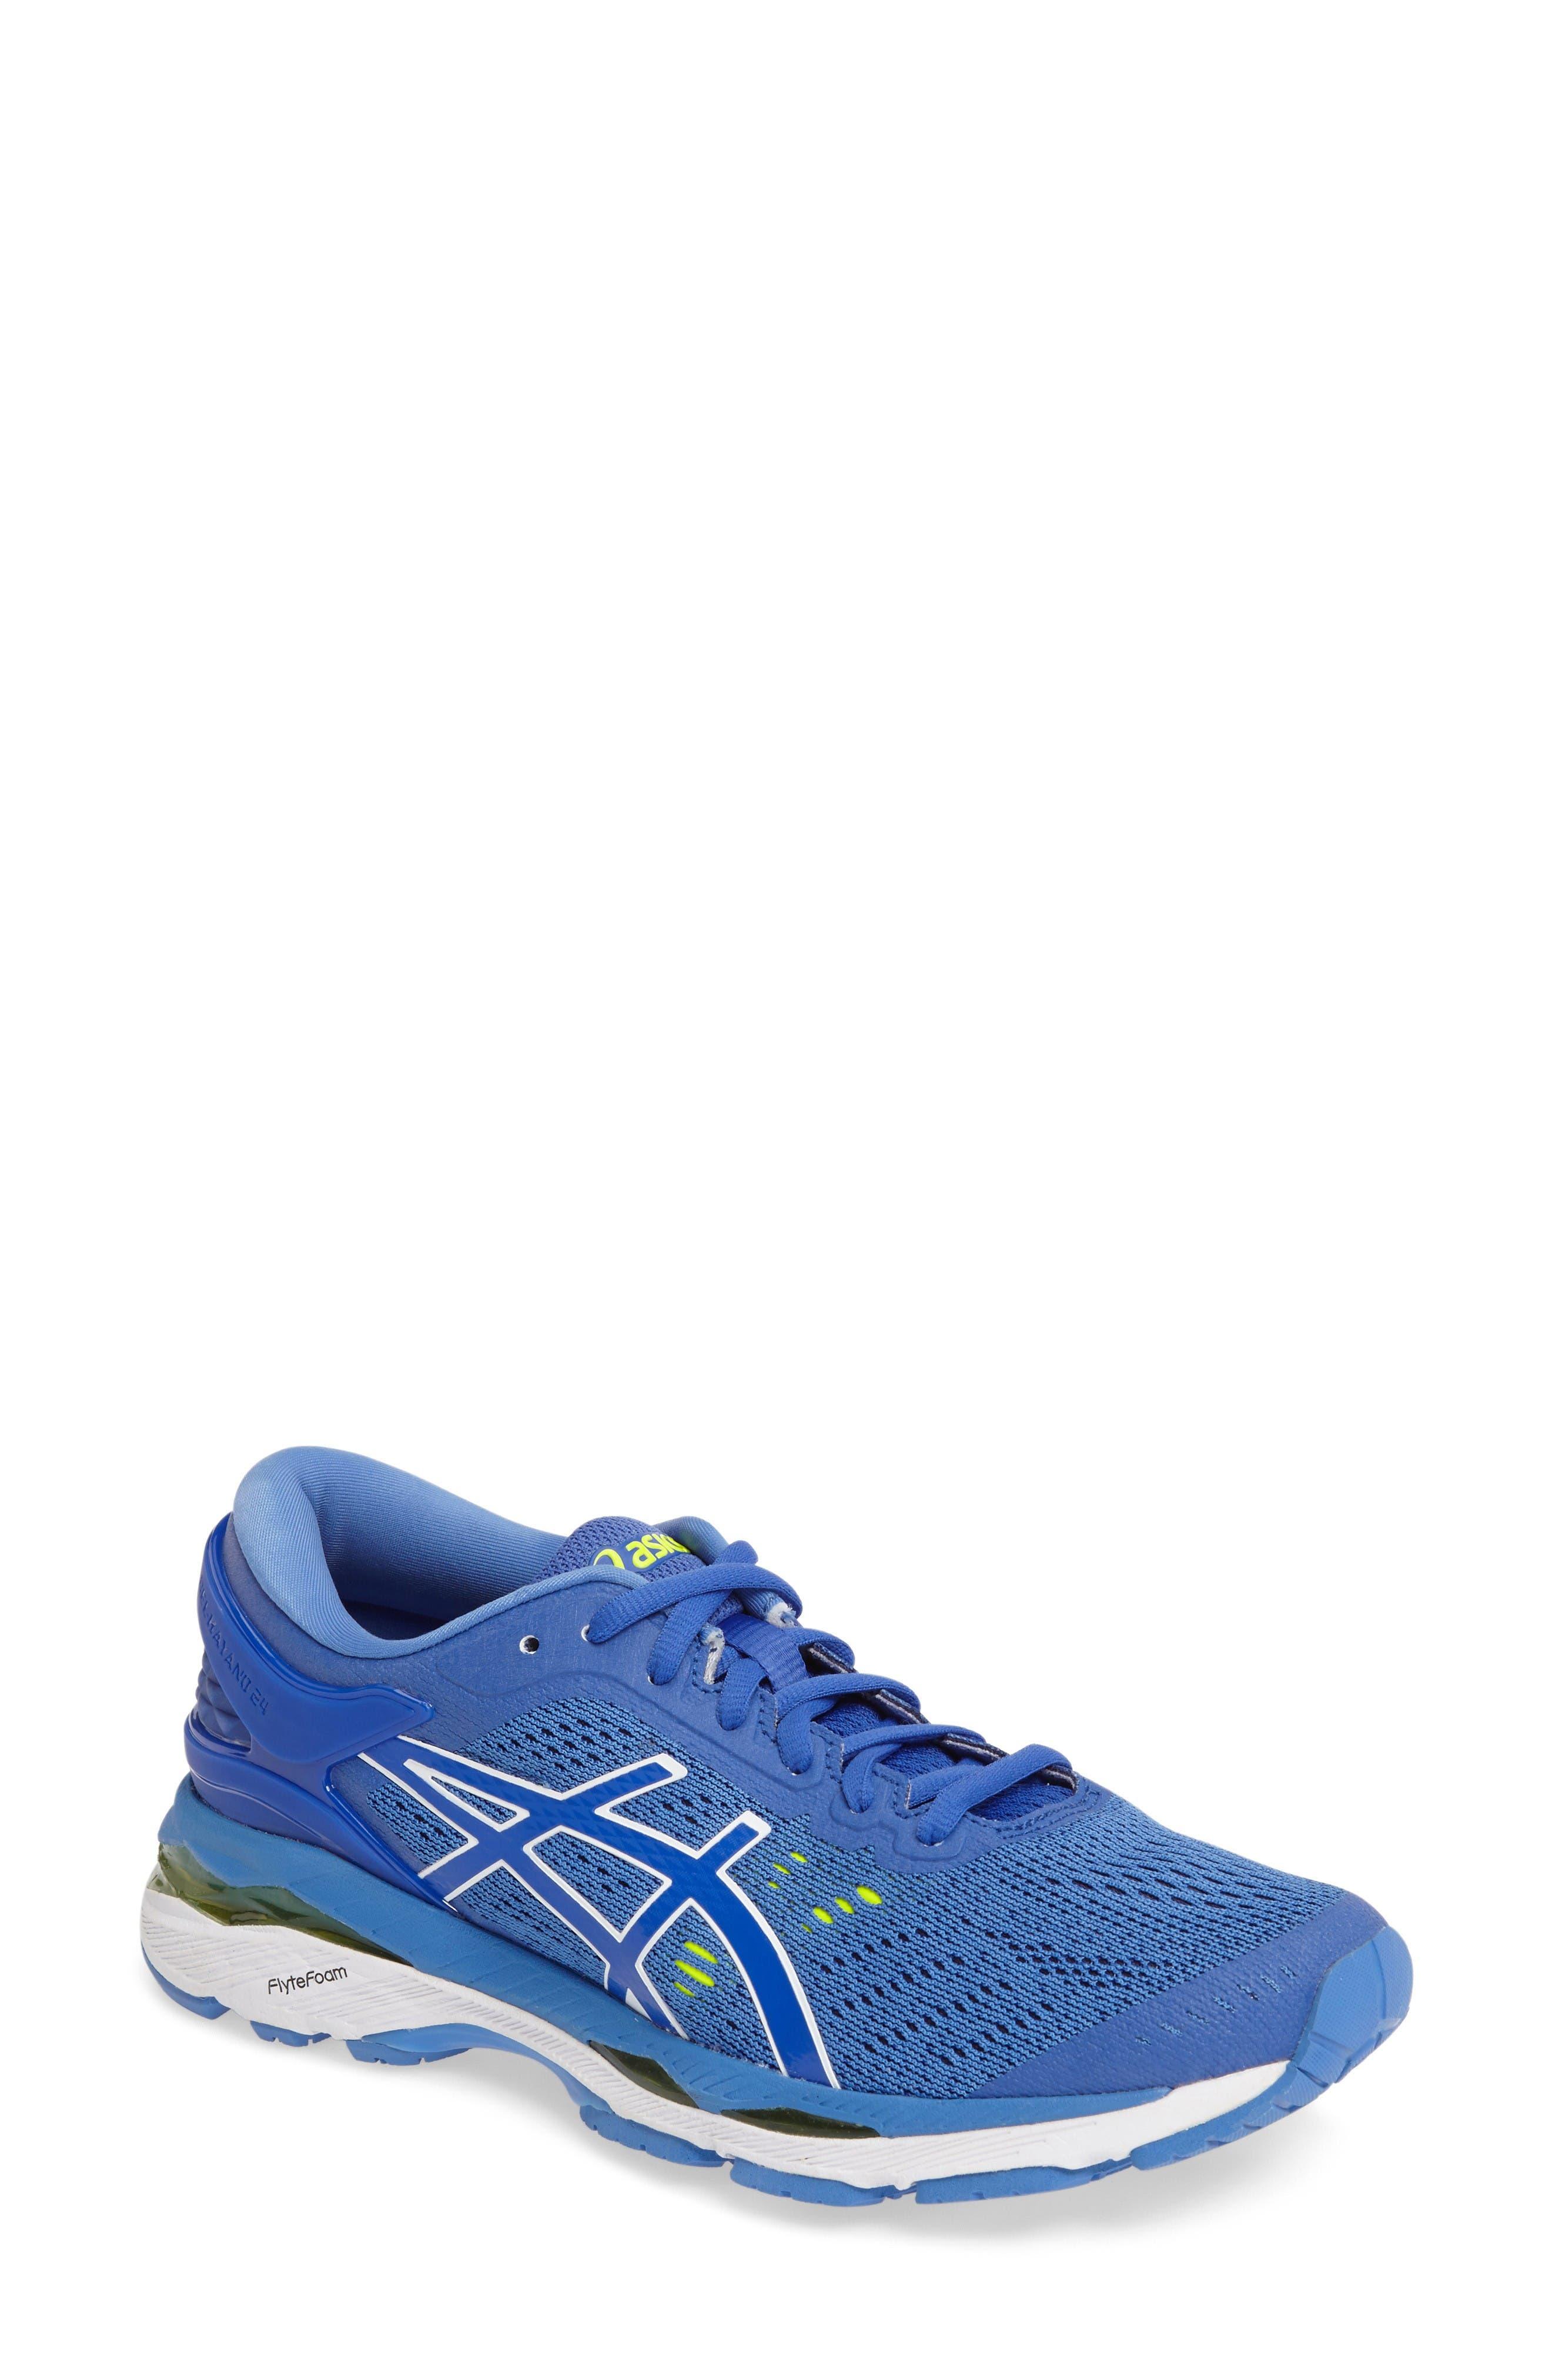 GEL-Kayano<sup>®</sup> 24 Running Shoe,                             Main thumbnail 1, color,                             Blue Purple/ Regatta/ White